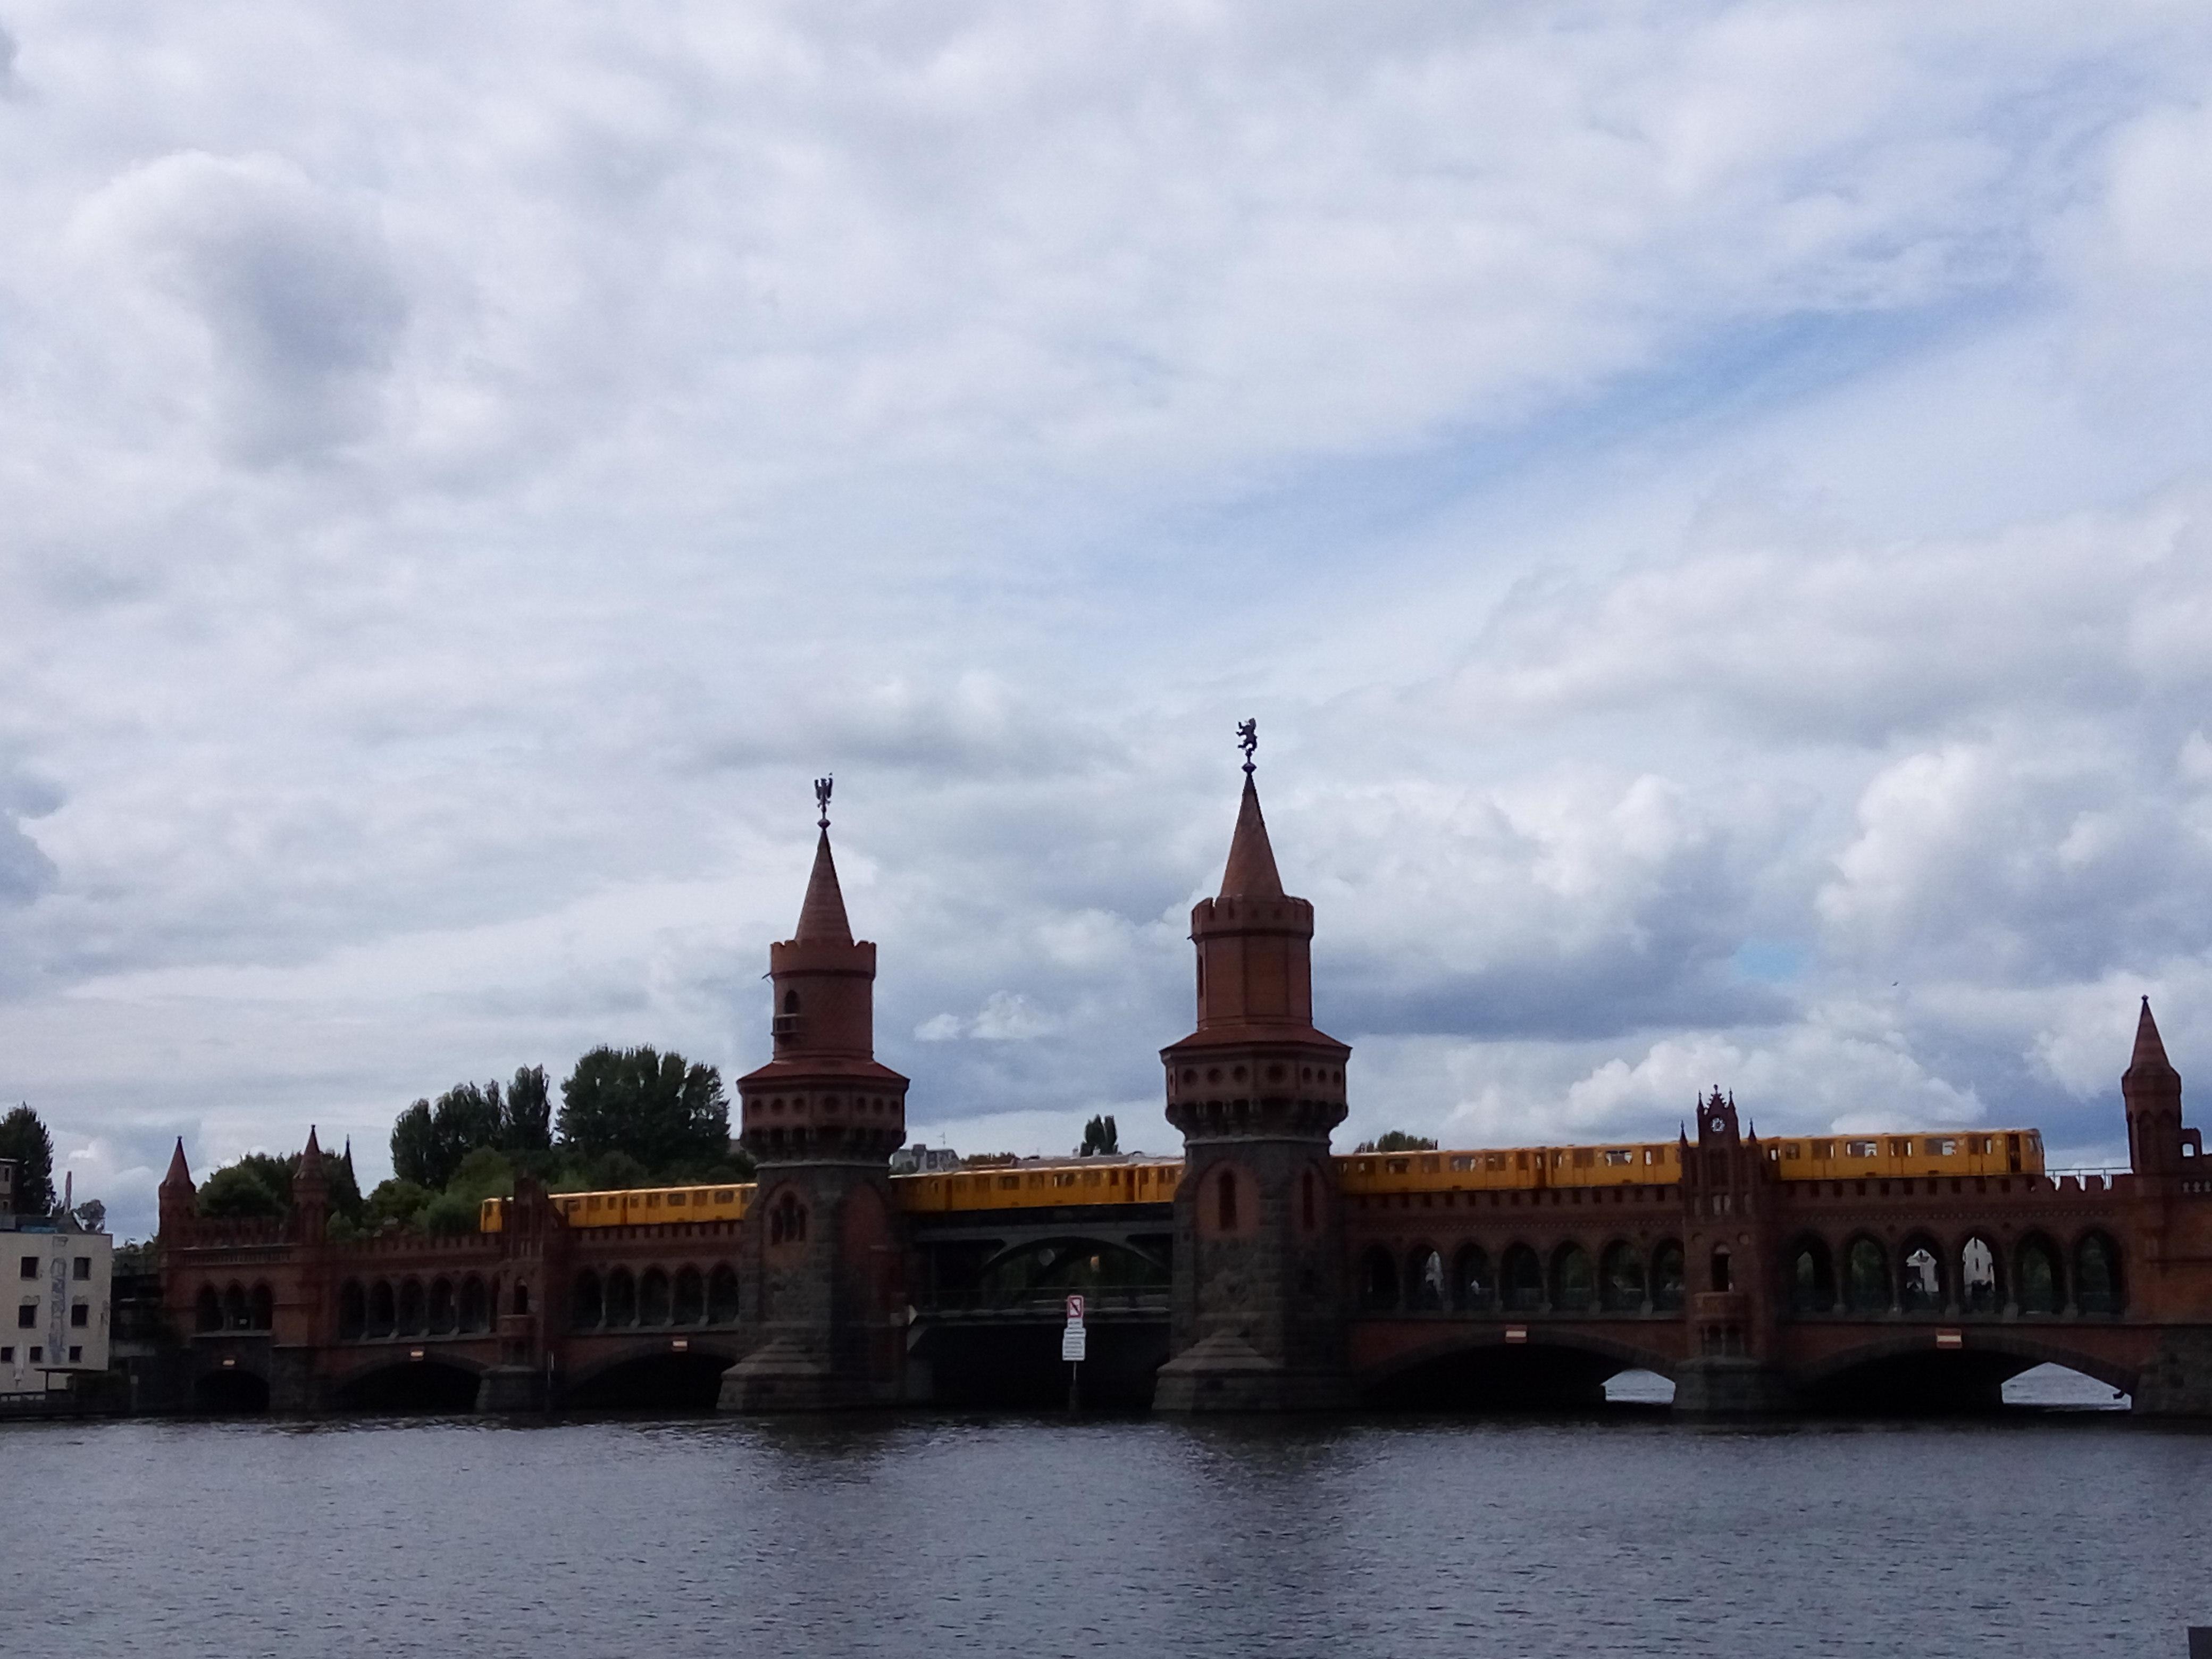 oberbaumbrucke-train-berlin